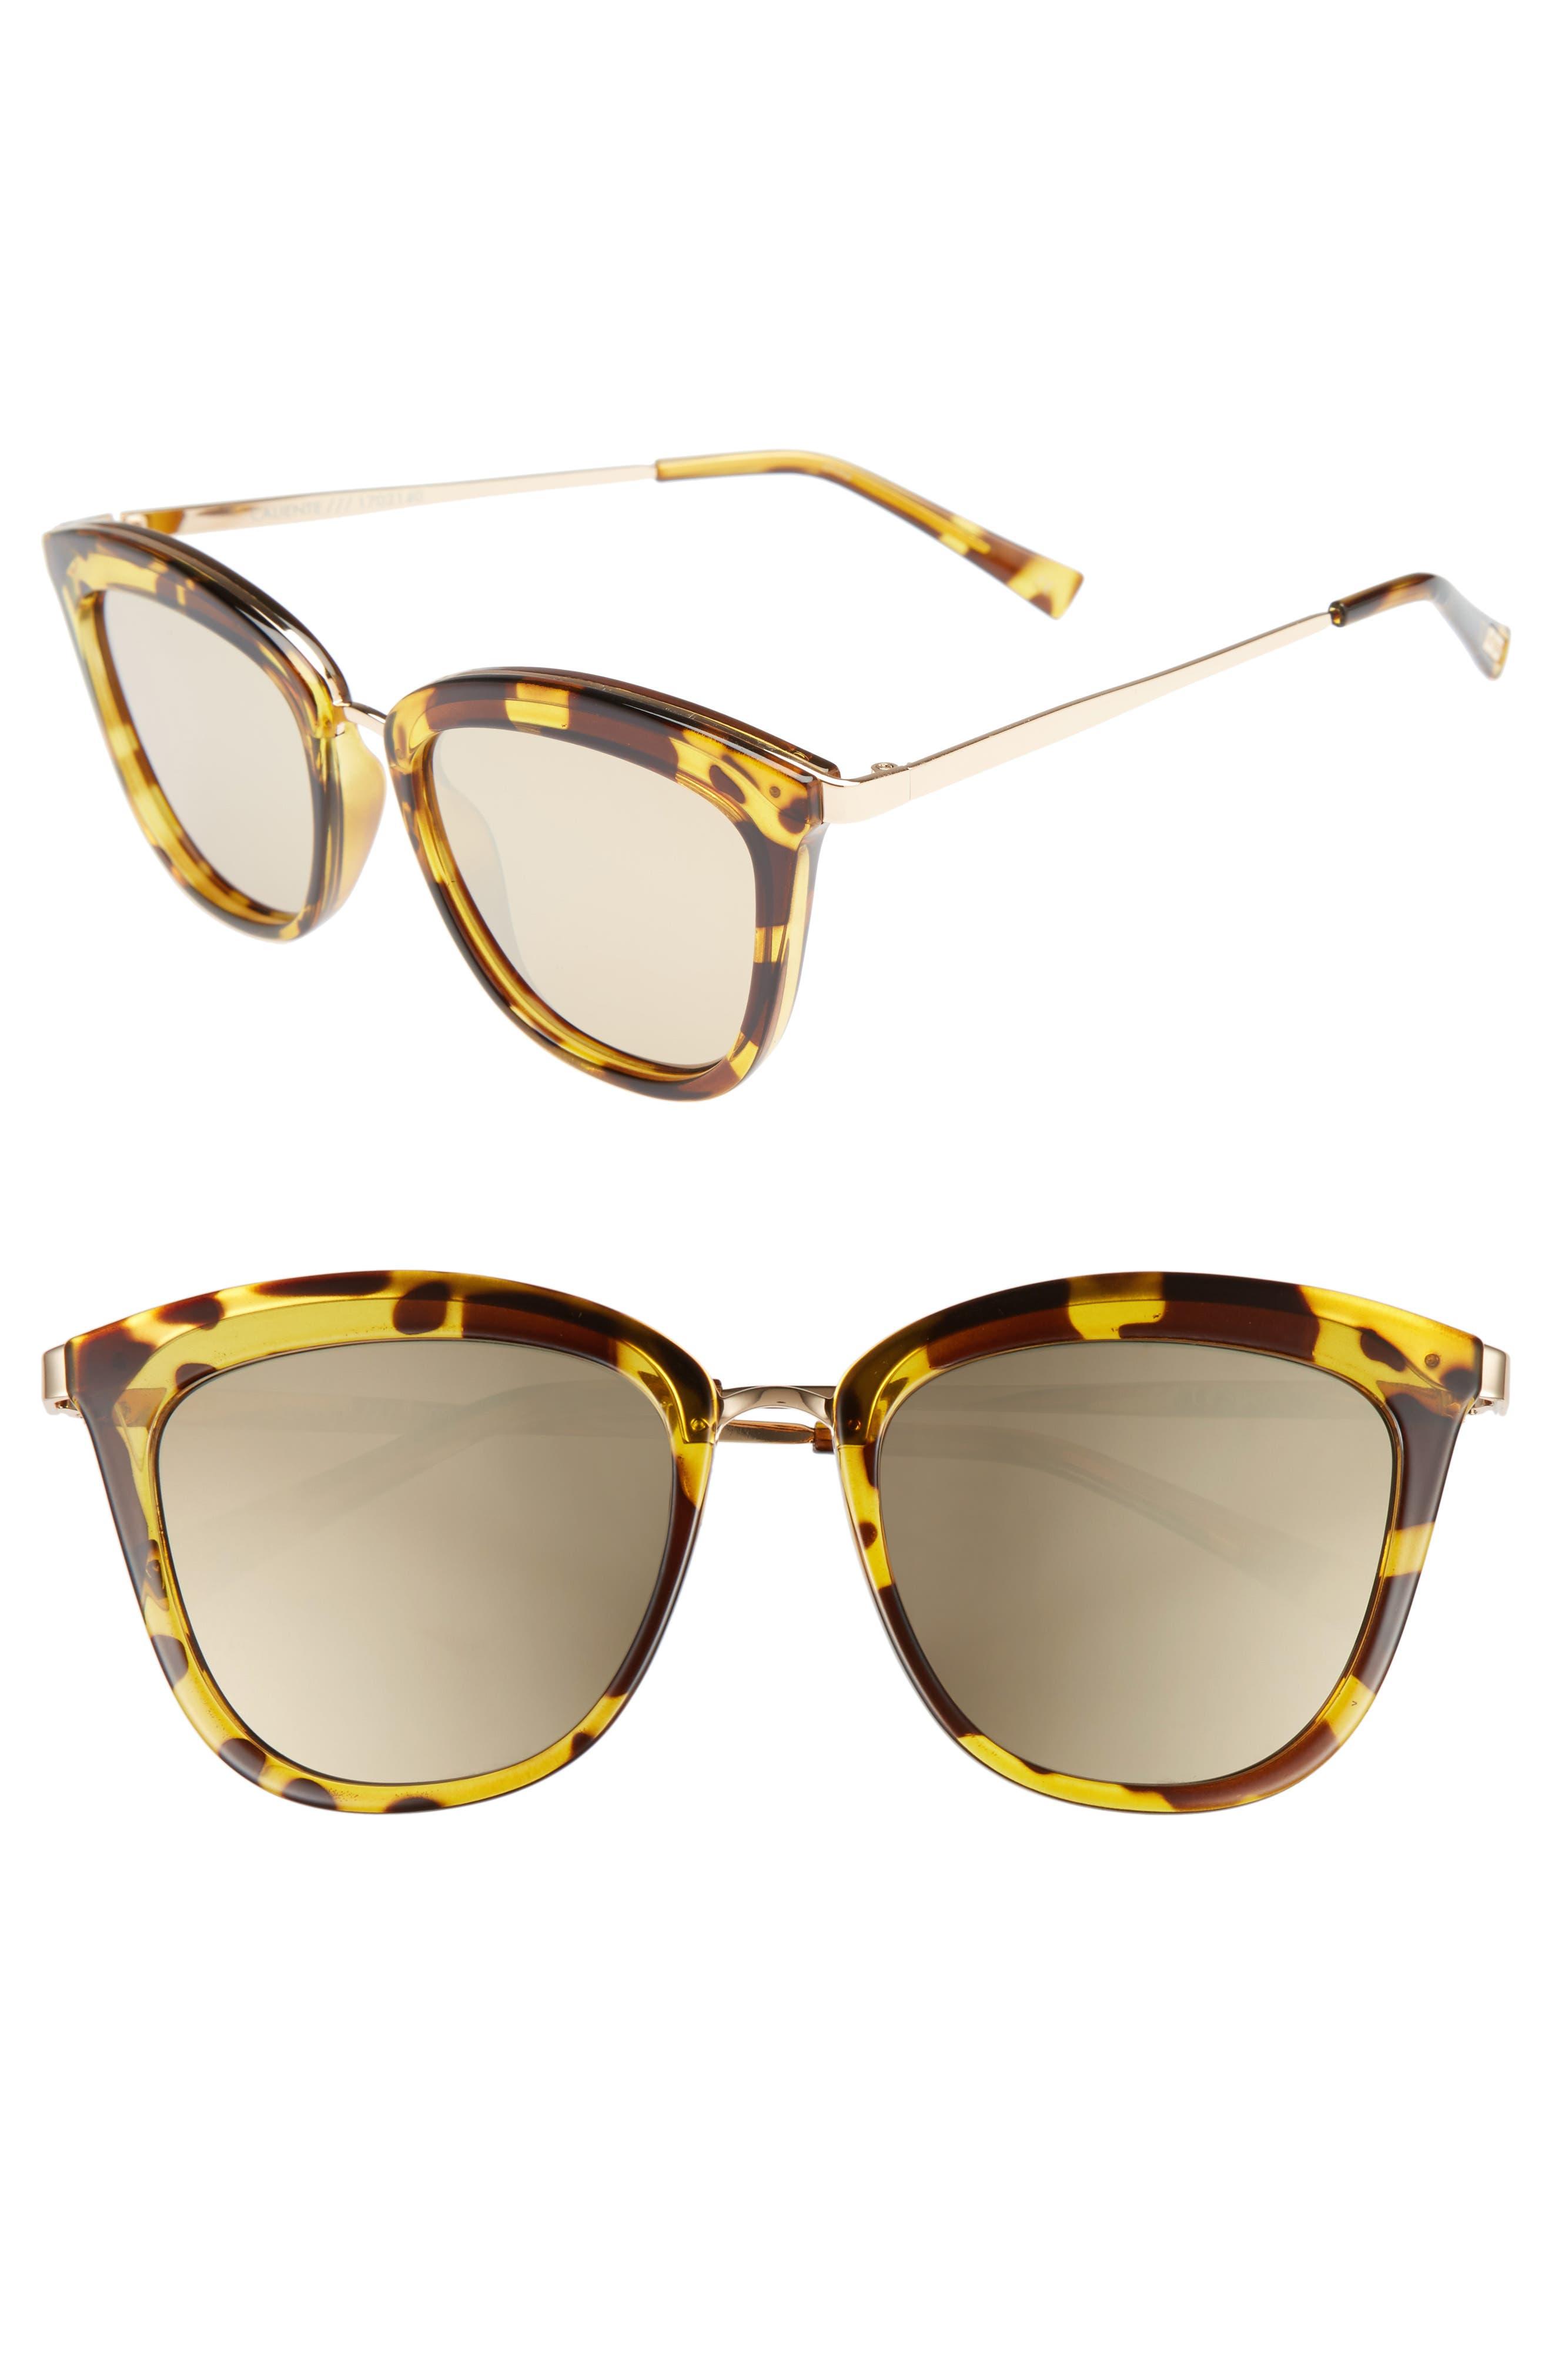 Le Specs Caliente 5m Cat Eye Sunglasses - Syrup Tort